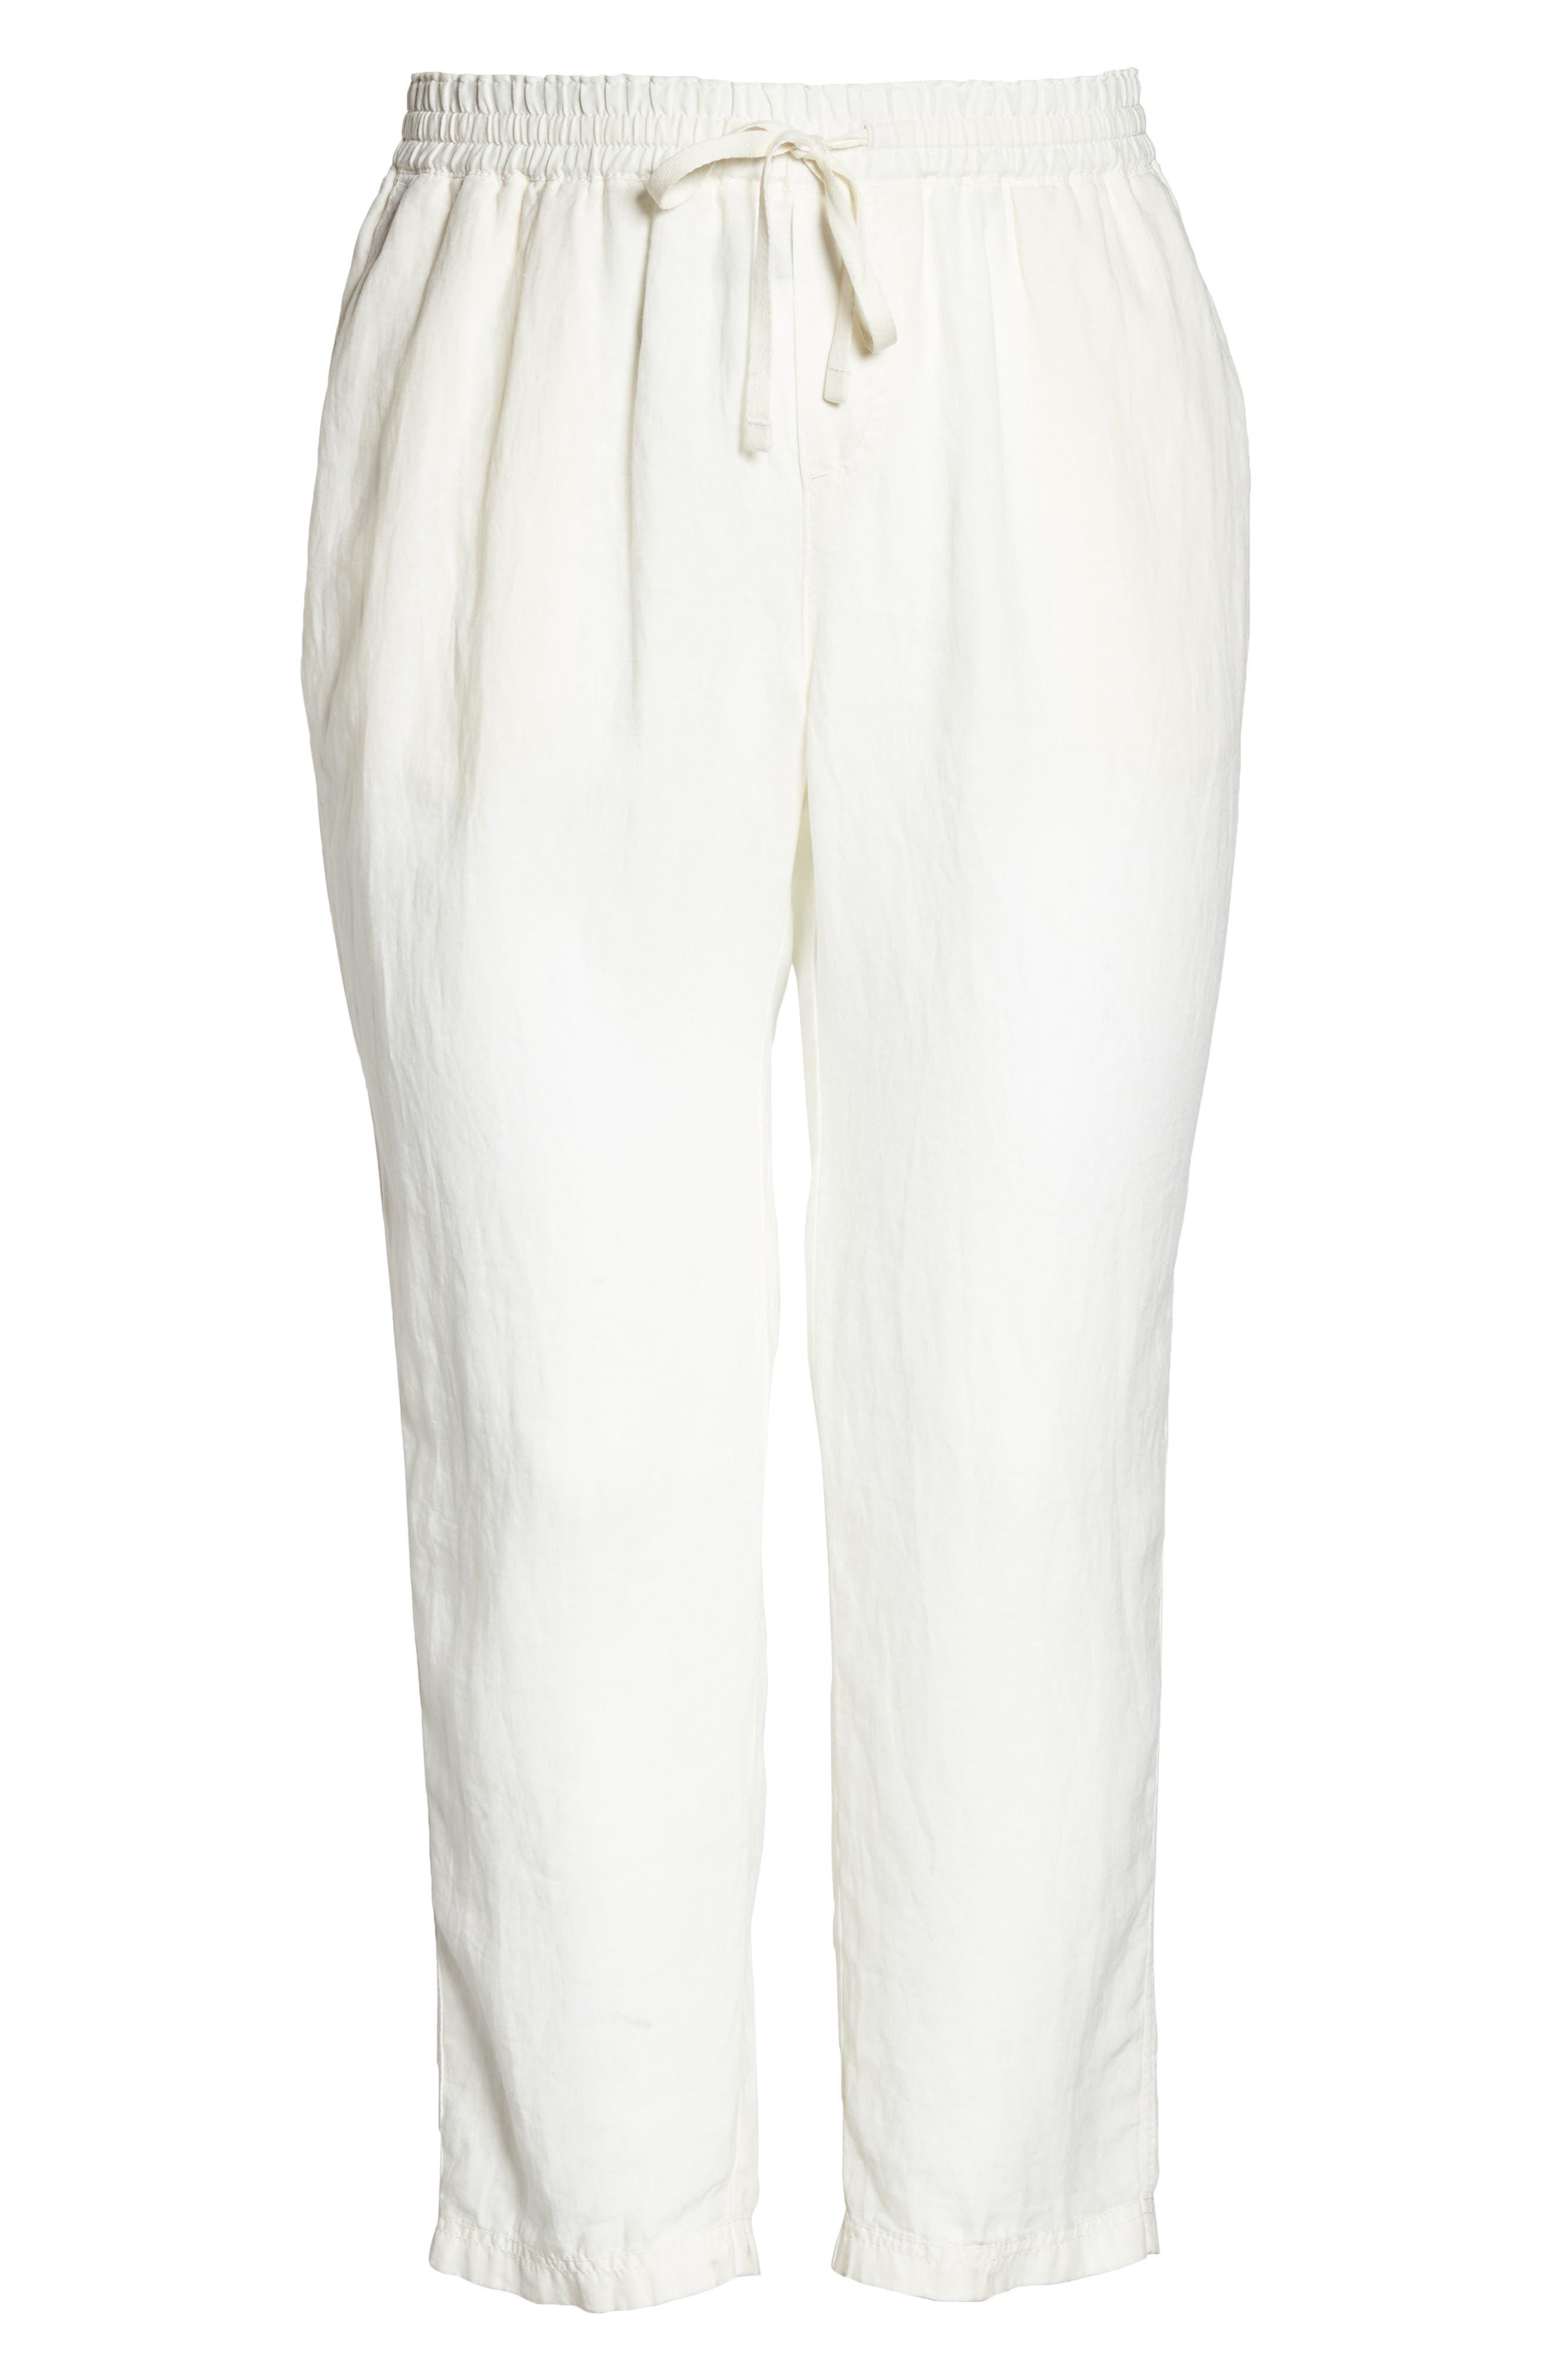 Linen Drawstring Pants,                             Alternate thumbnail 7, color,                             900